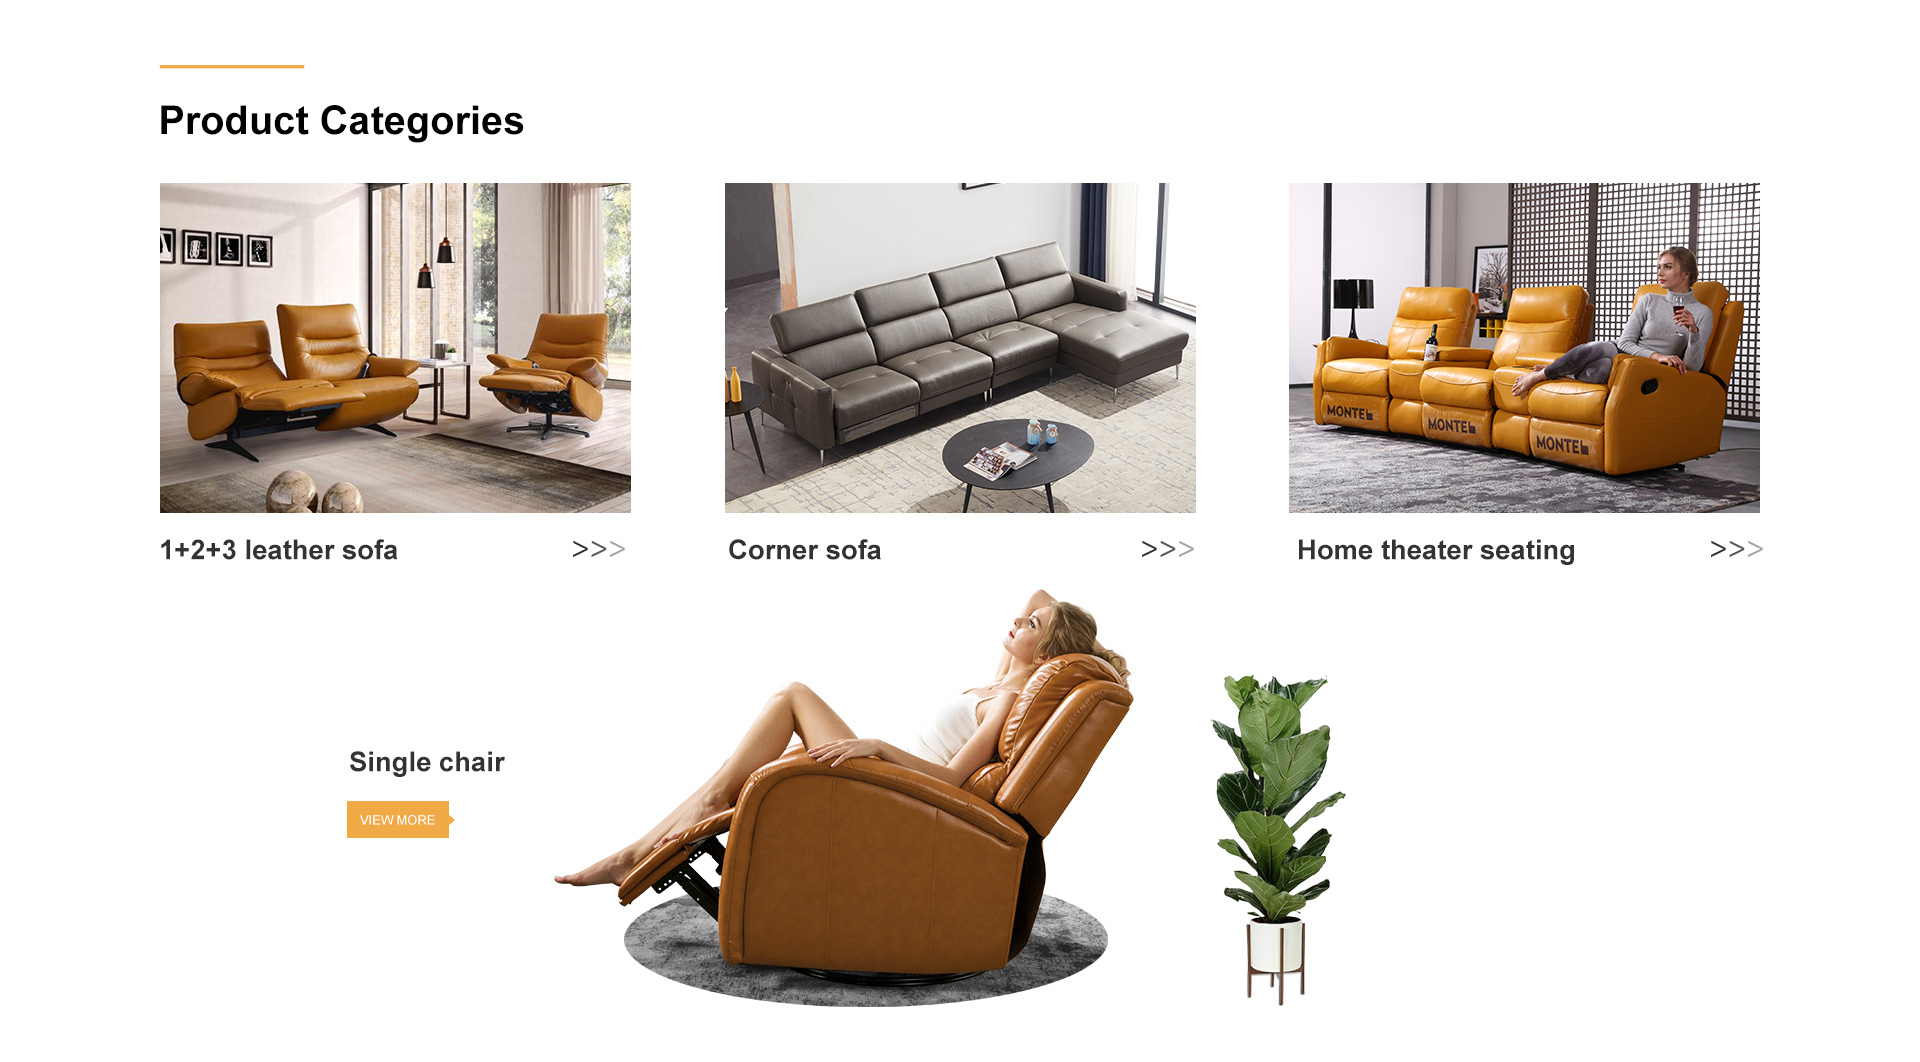 Hoekbank Leer Montel.Foshan Shunde Montel Furniture Co Ltd Sofa Leather Sofa